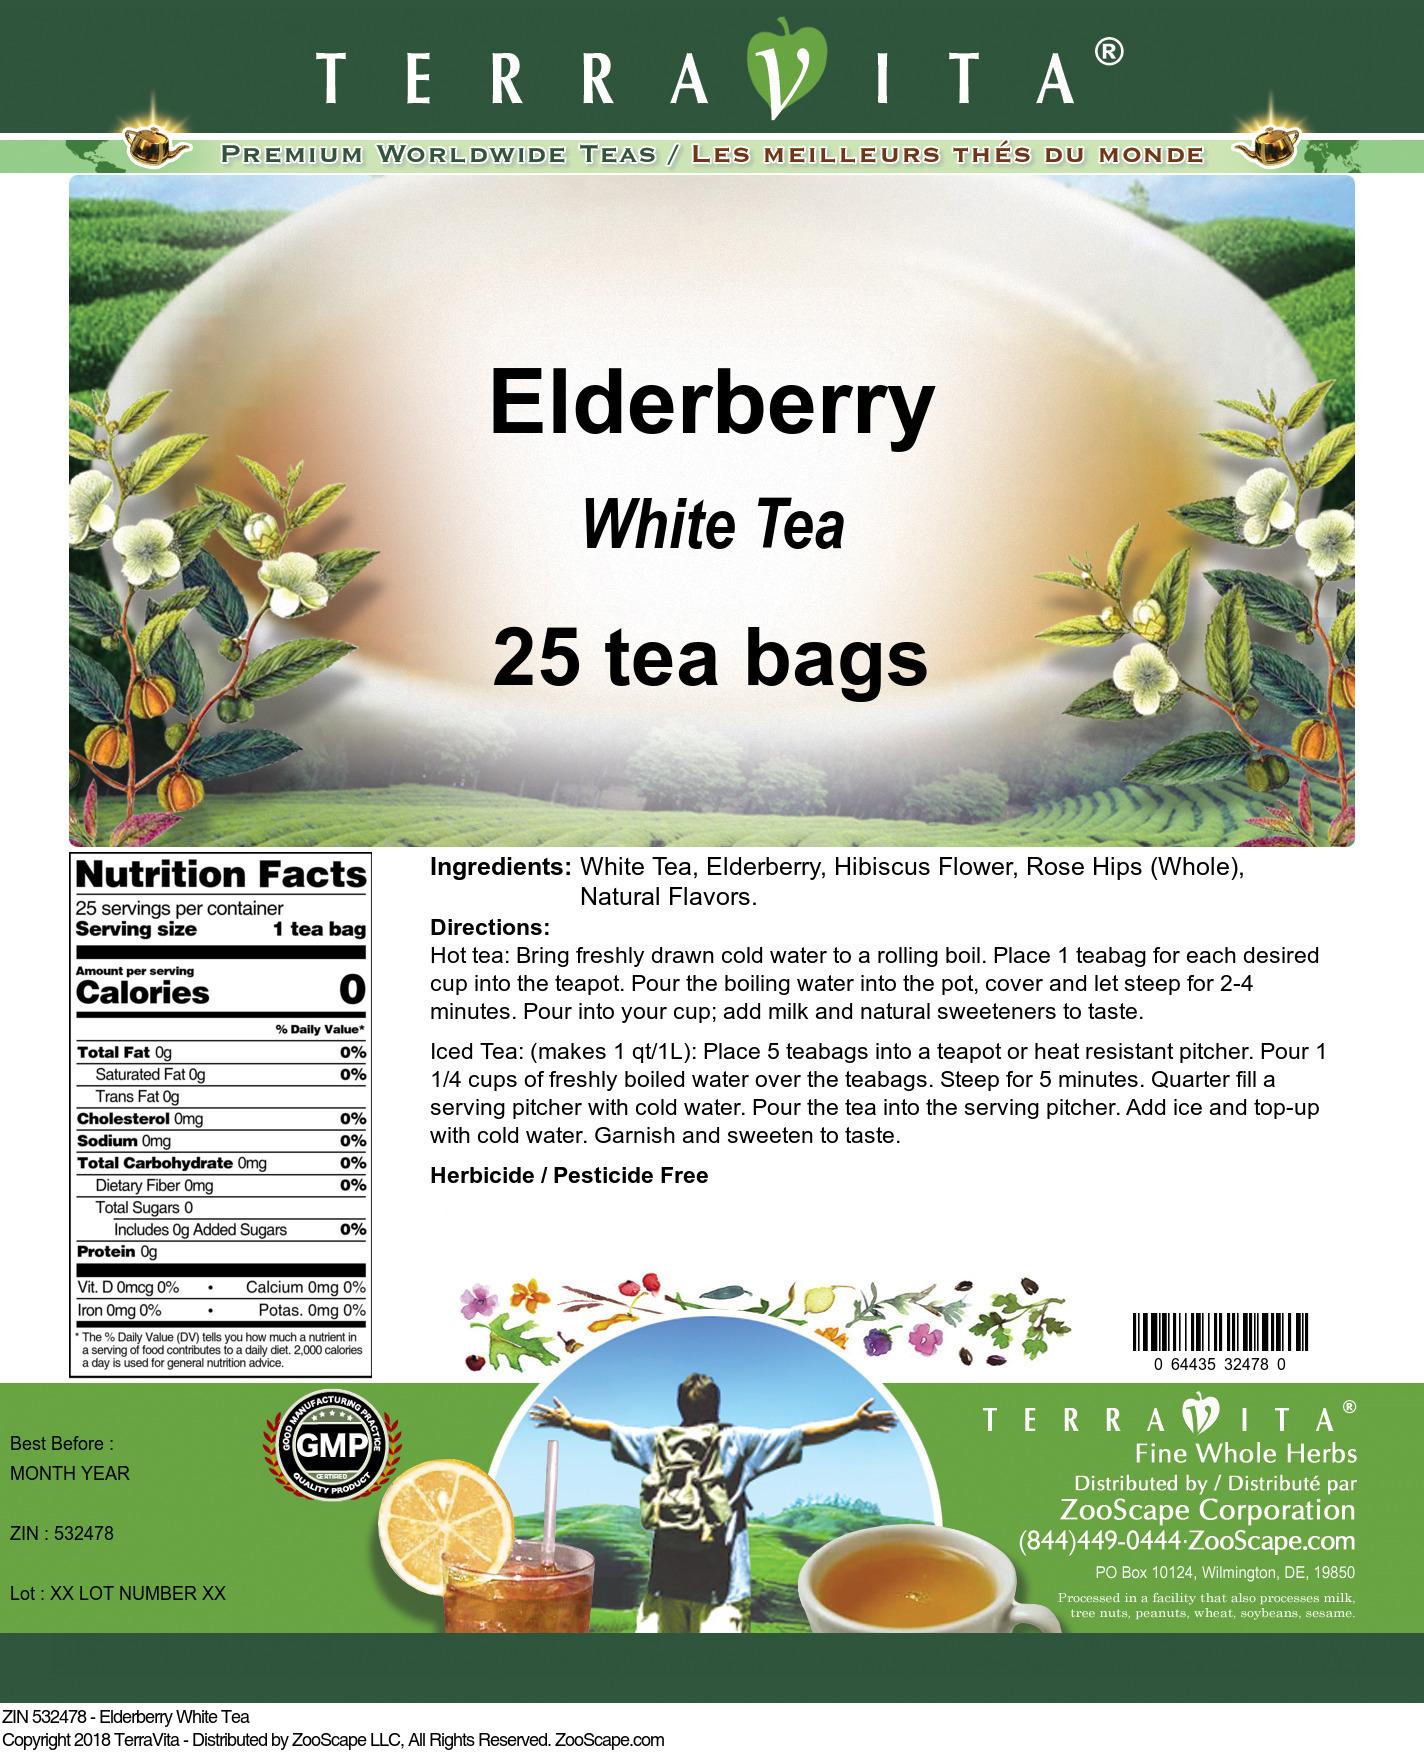 Elderberry White Tea